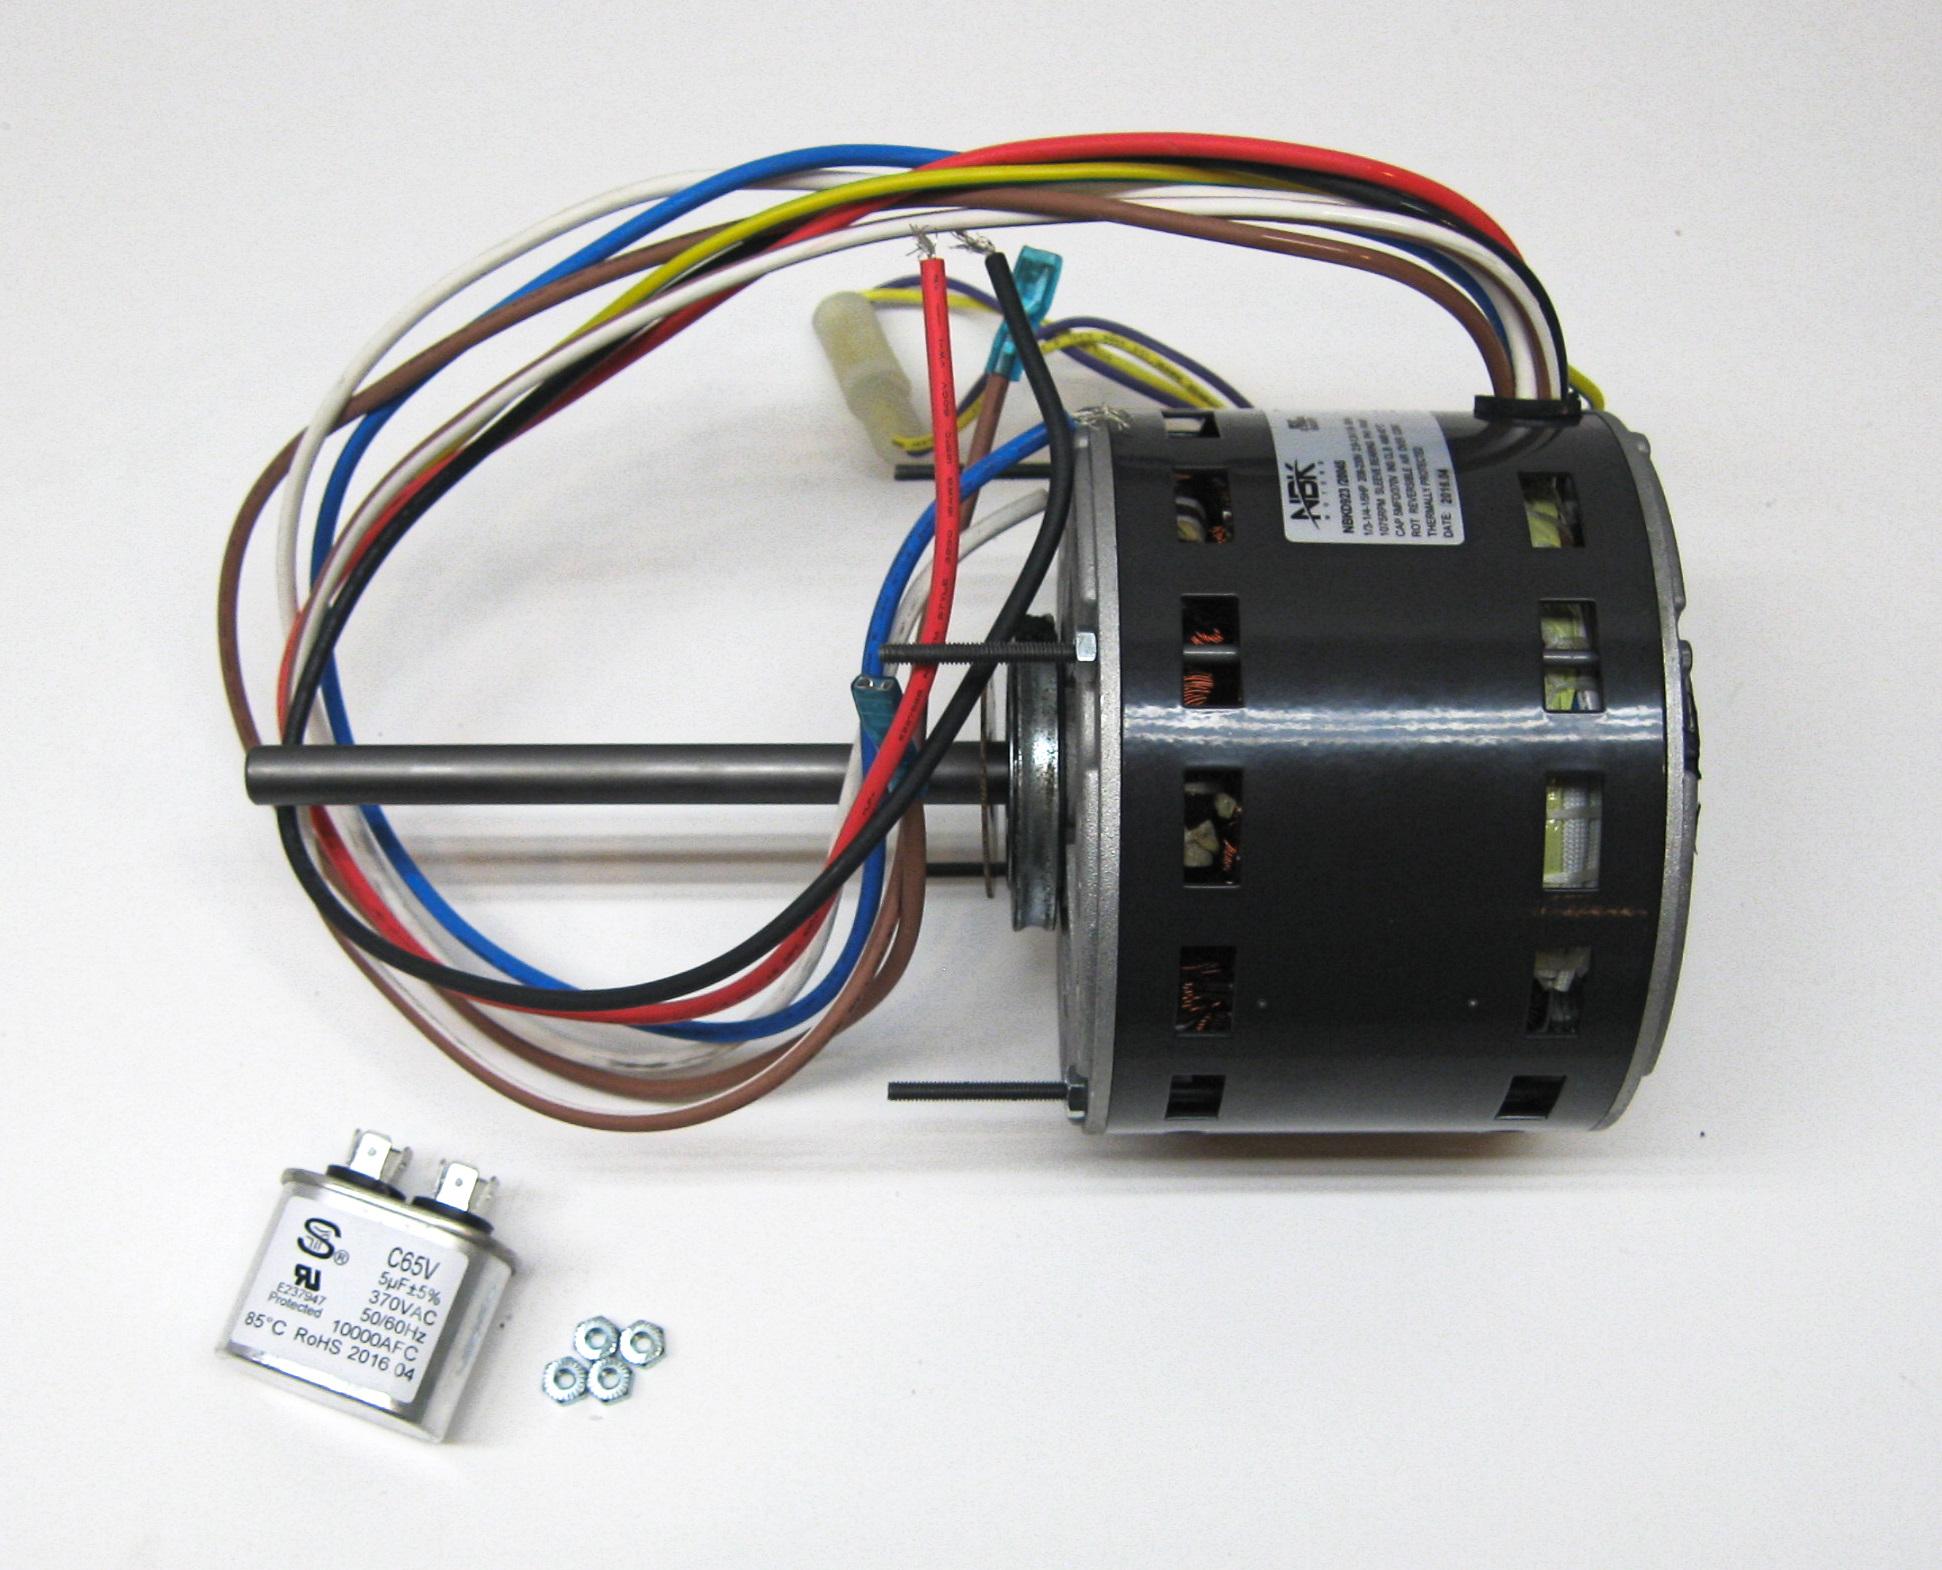 [SCHEMATICS_4JK]  B142 Three Speed Furnace Fan Motor Wiring | Wiring Resources | Fasco Furnace Motor Wiring Diagrams |  | Wiring Resources